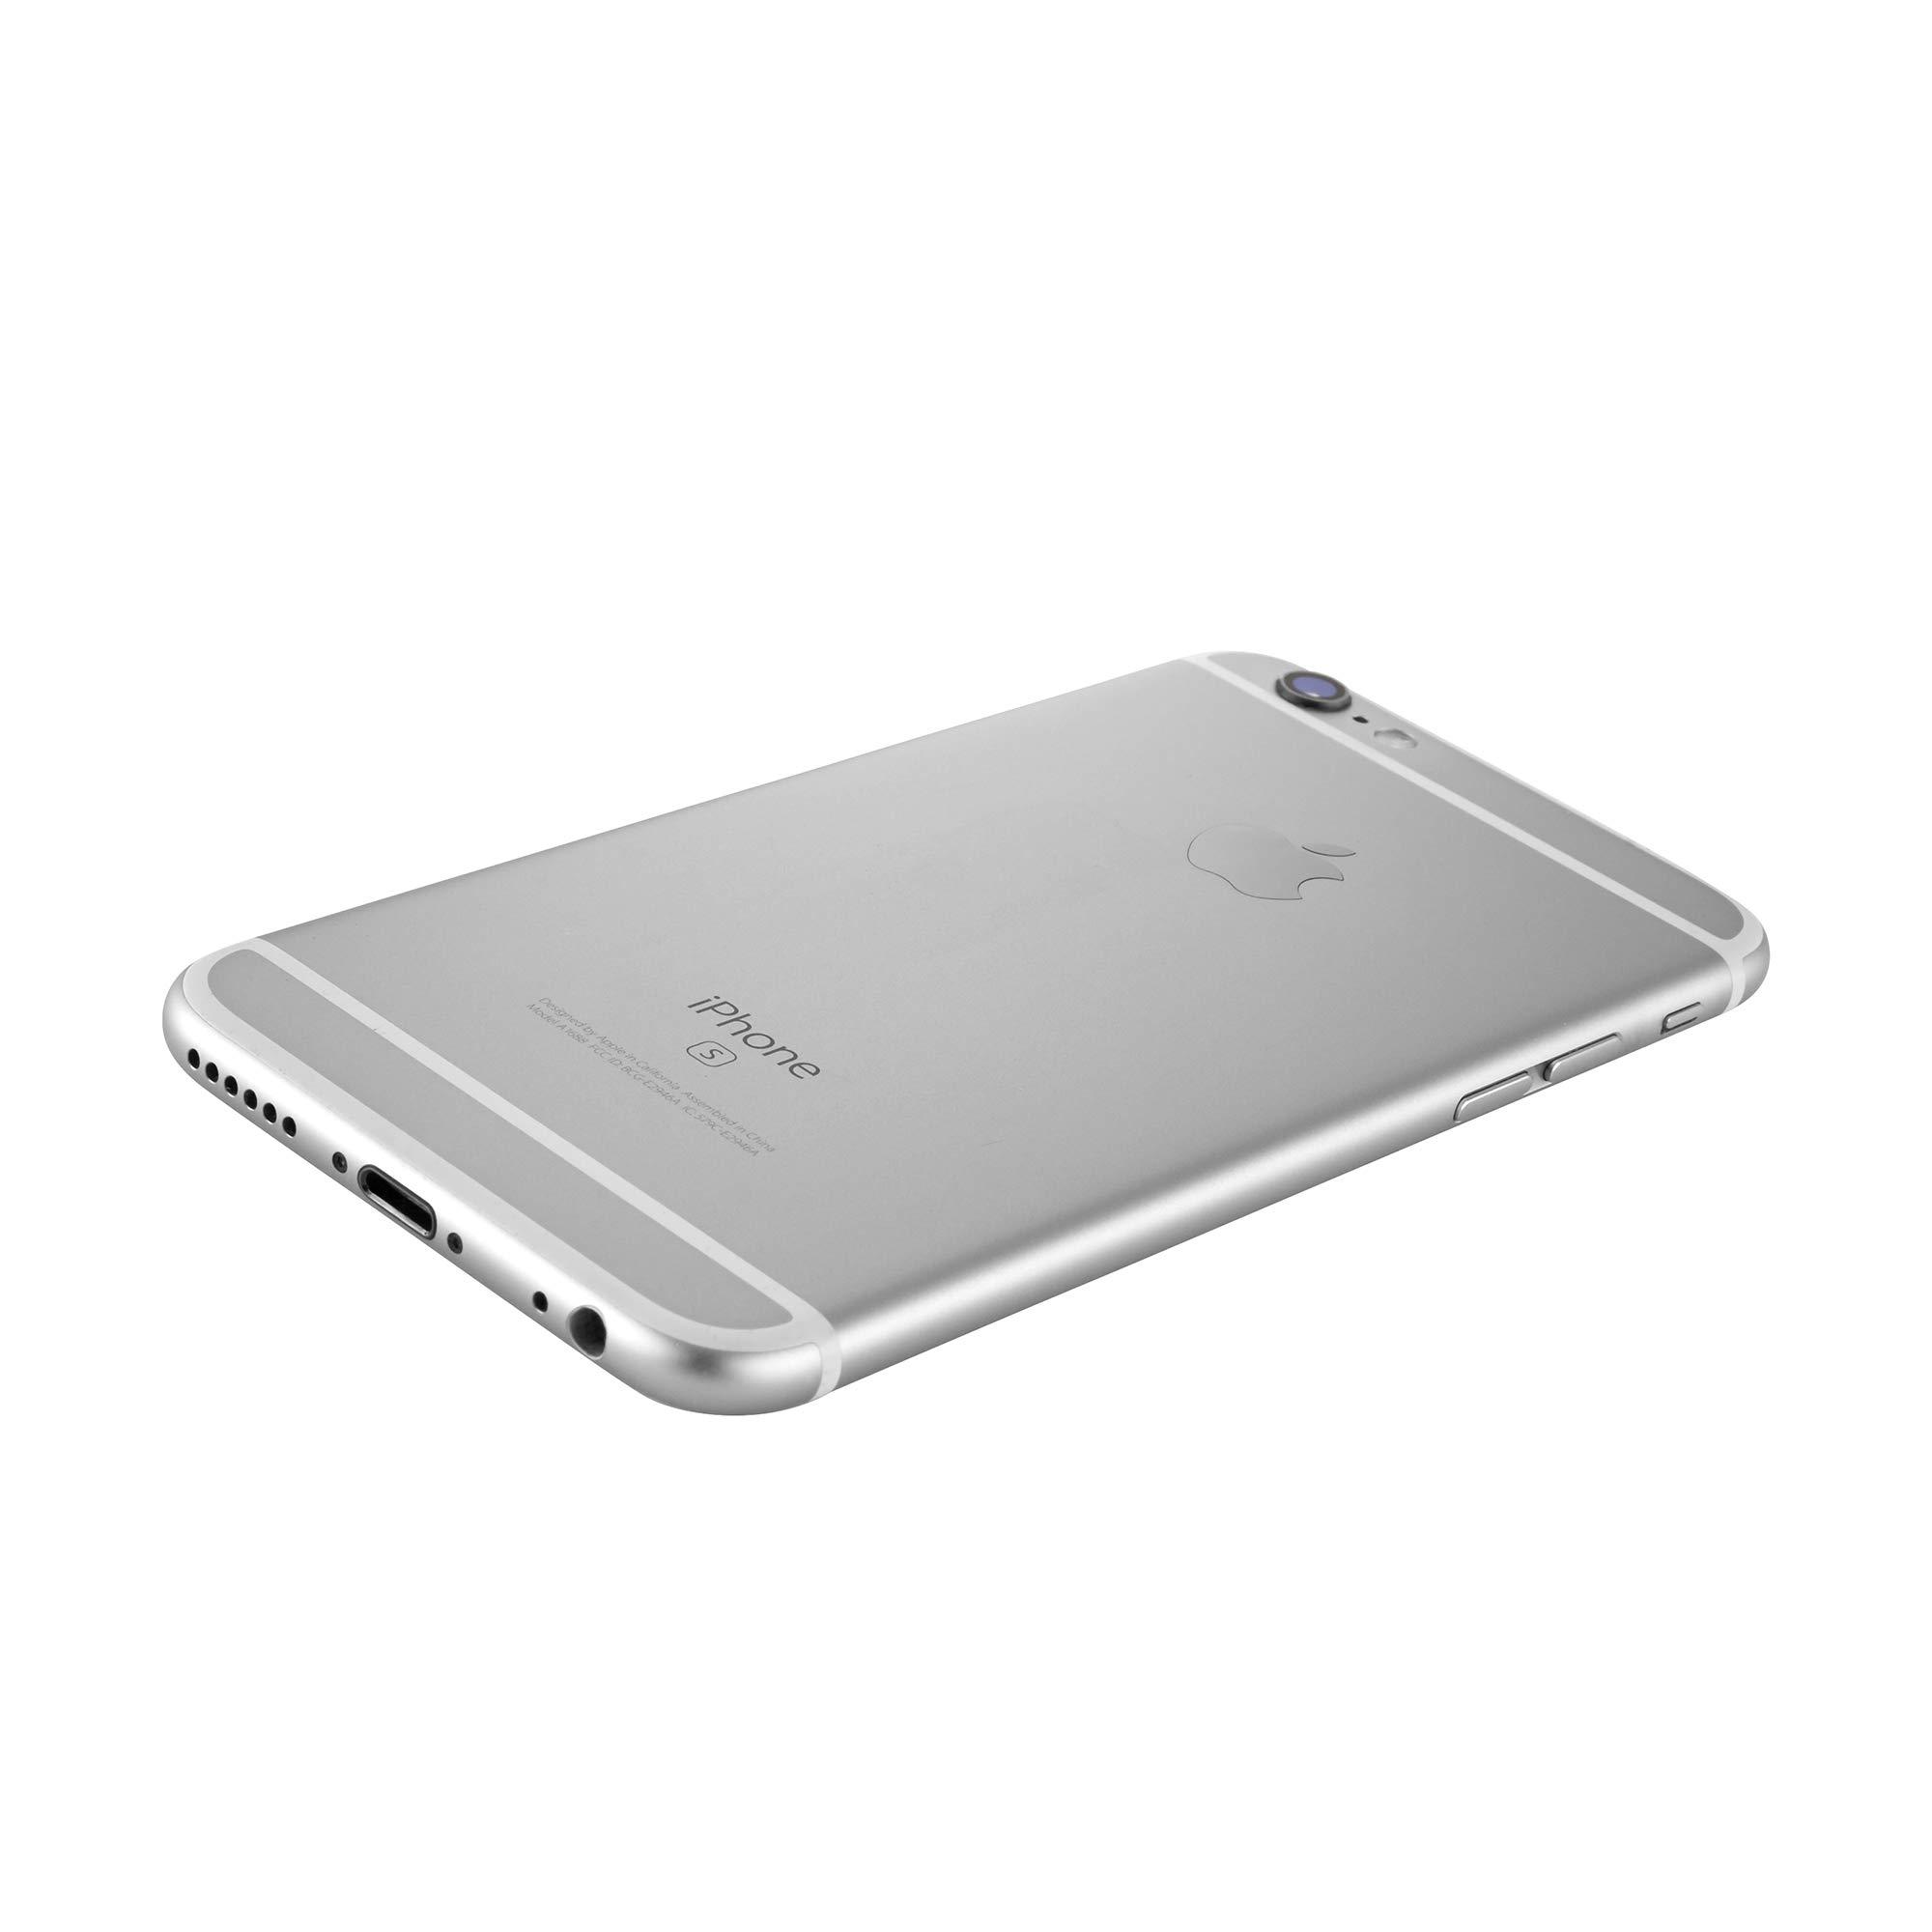 Promo Harga Apple Iphone 6s A1688 64gb Cdma Unlocked Certified Elle Spirit Es20095s02x Jam Tangan Wanita Hitam Silver Fully Refurbished Cell Phones Accessories Tibs